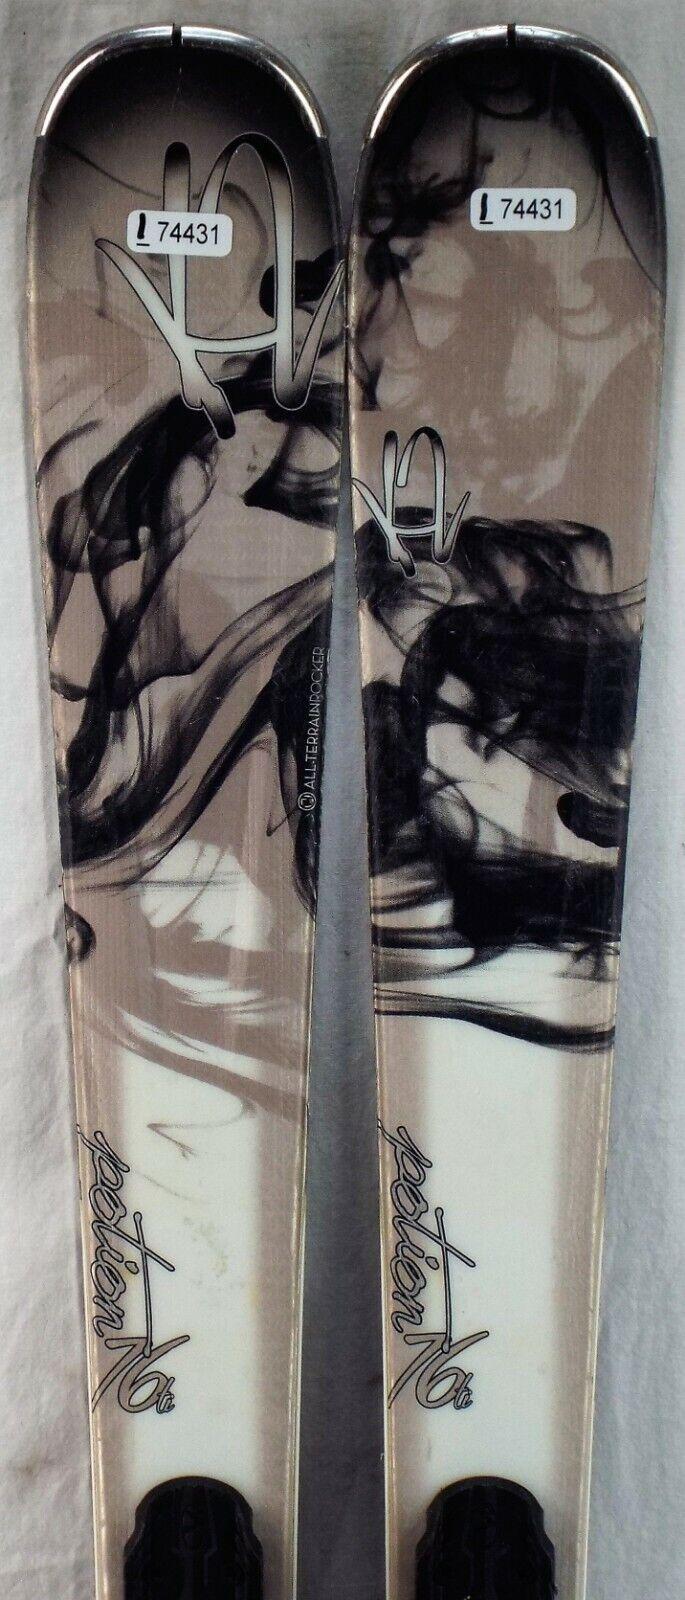 14-15 K2 Potion 76Ti Used Women's Demo Skis w Bindings Size 142cm